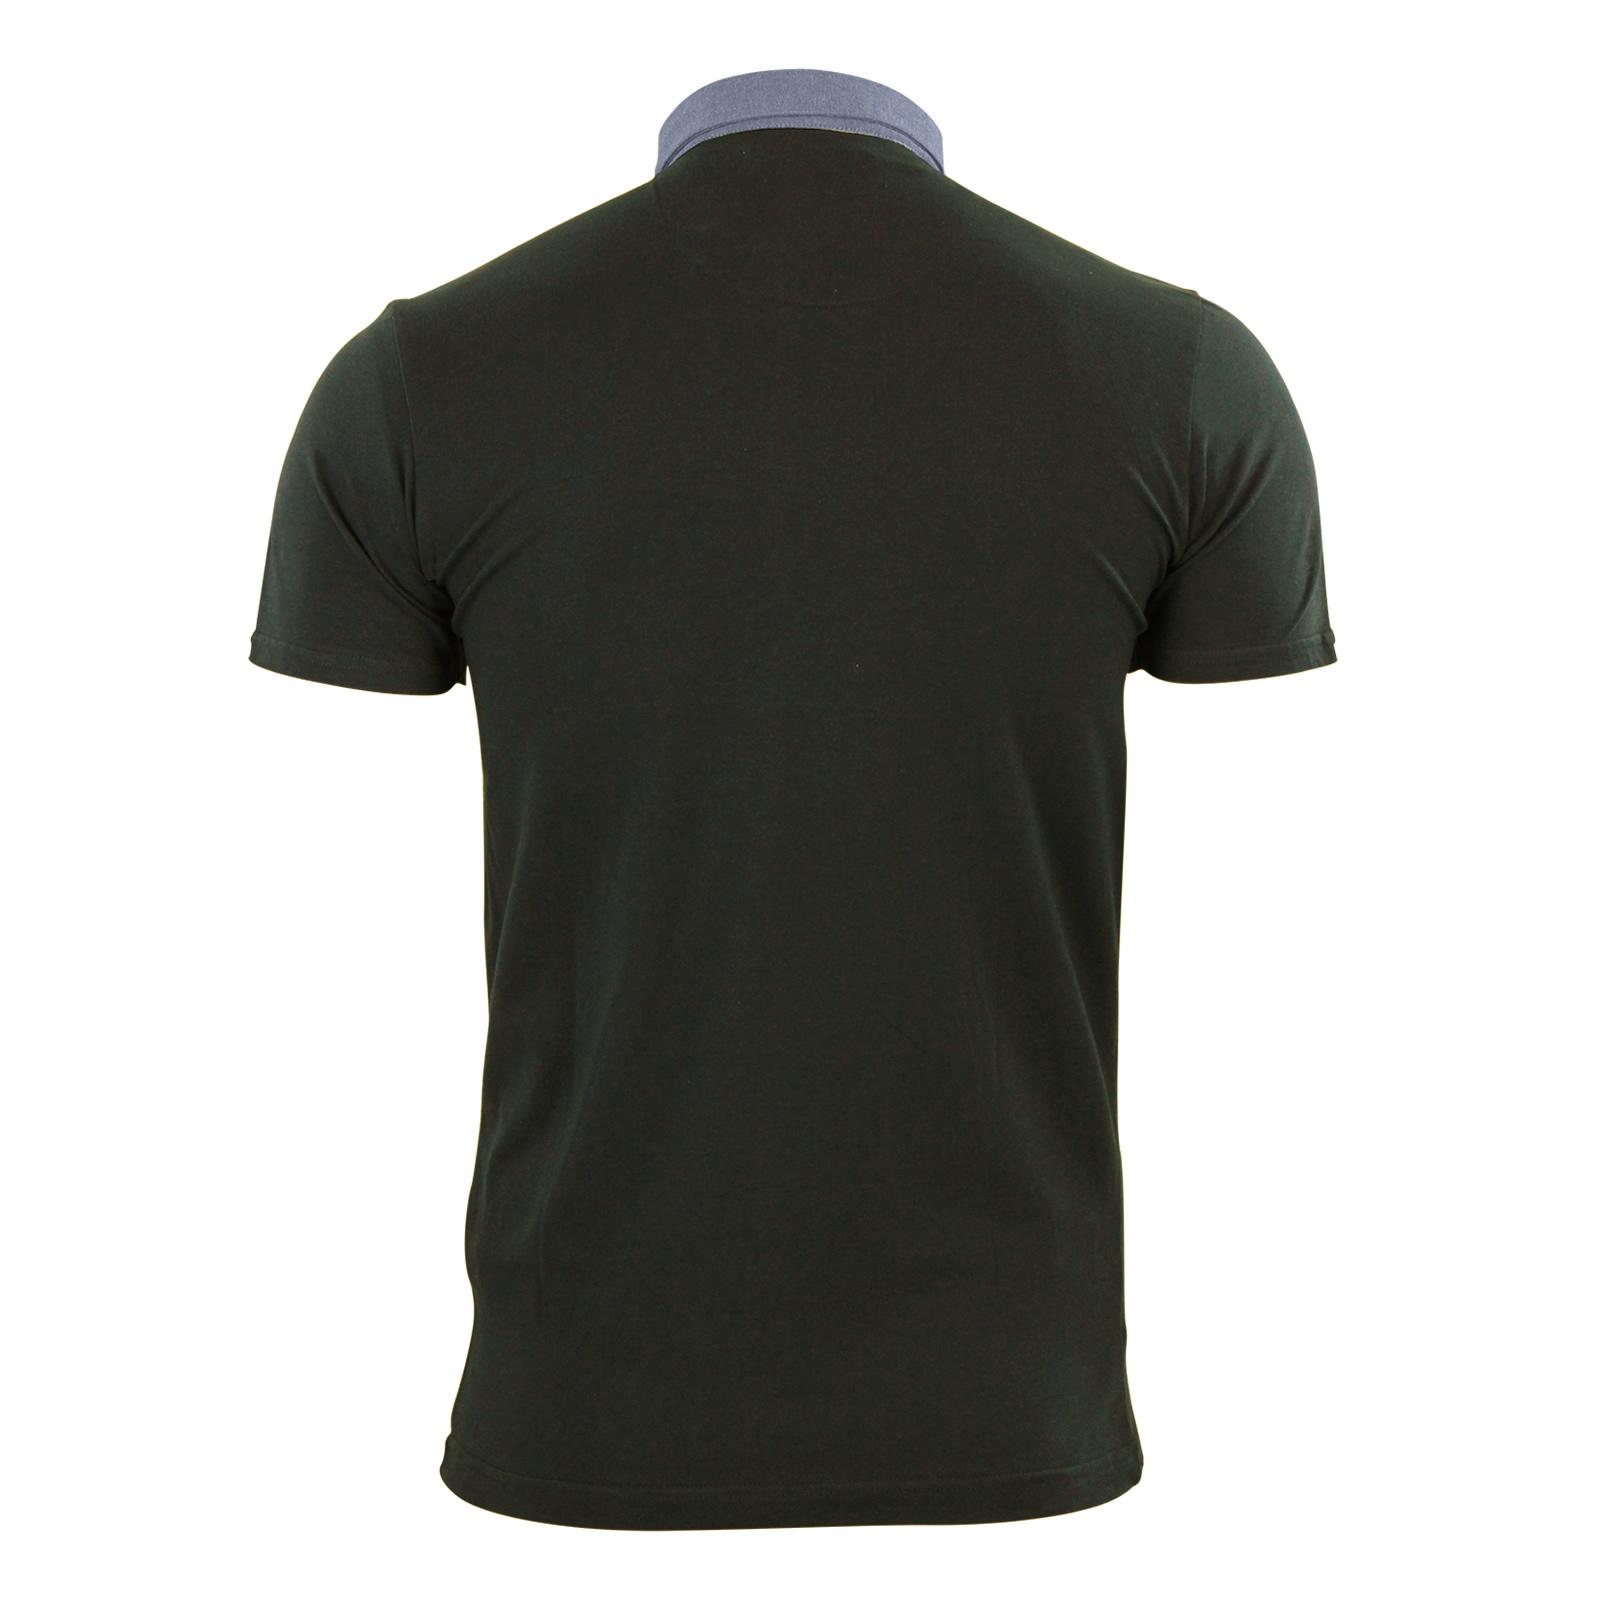 Mens-Polo-T-Shirt-Brave-Soul-Chimera-Chambray-Collared-Cotton-Casual-Top thumbnail 15